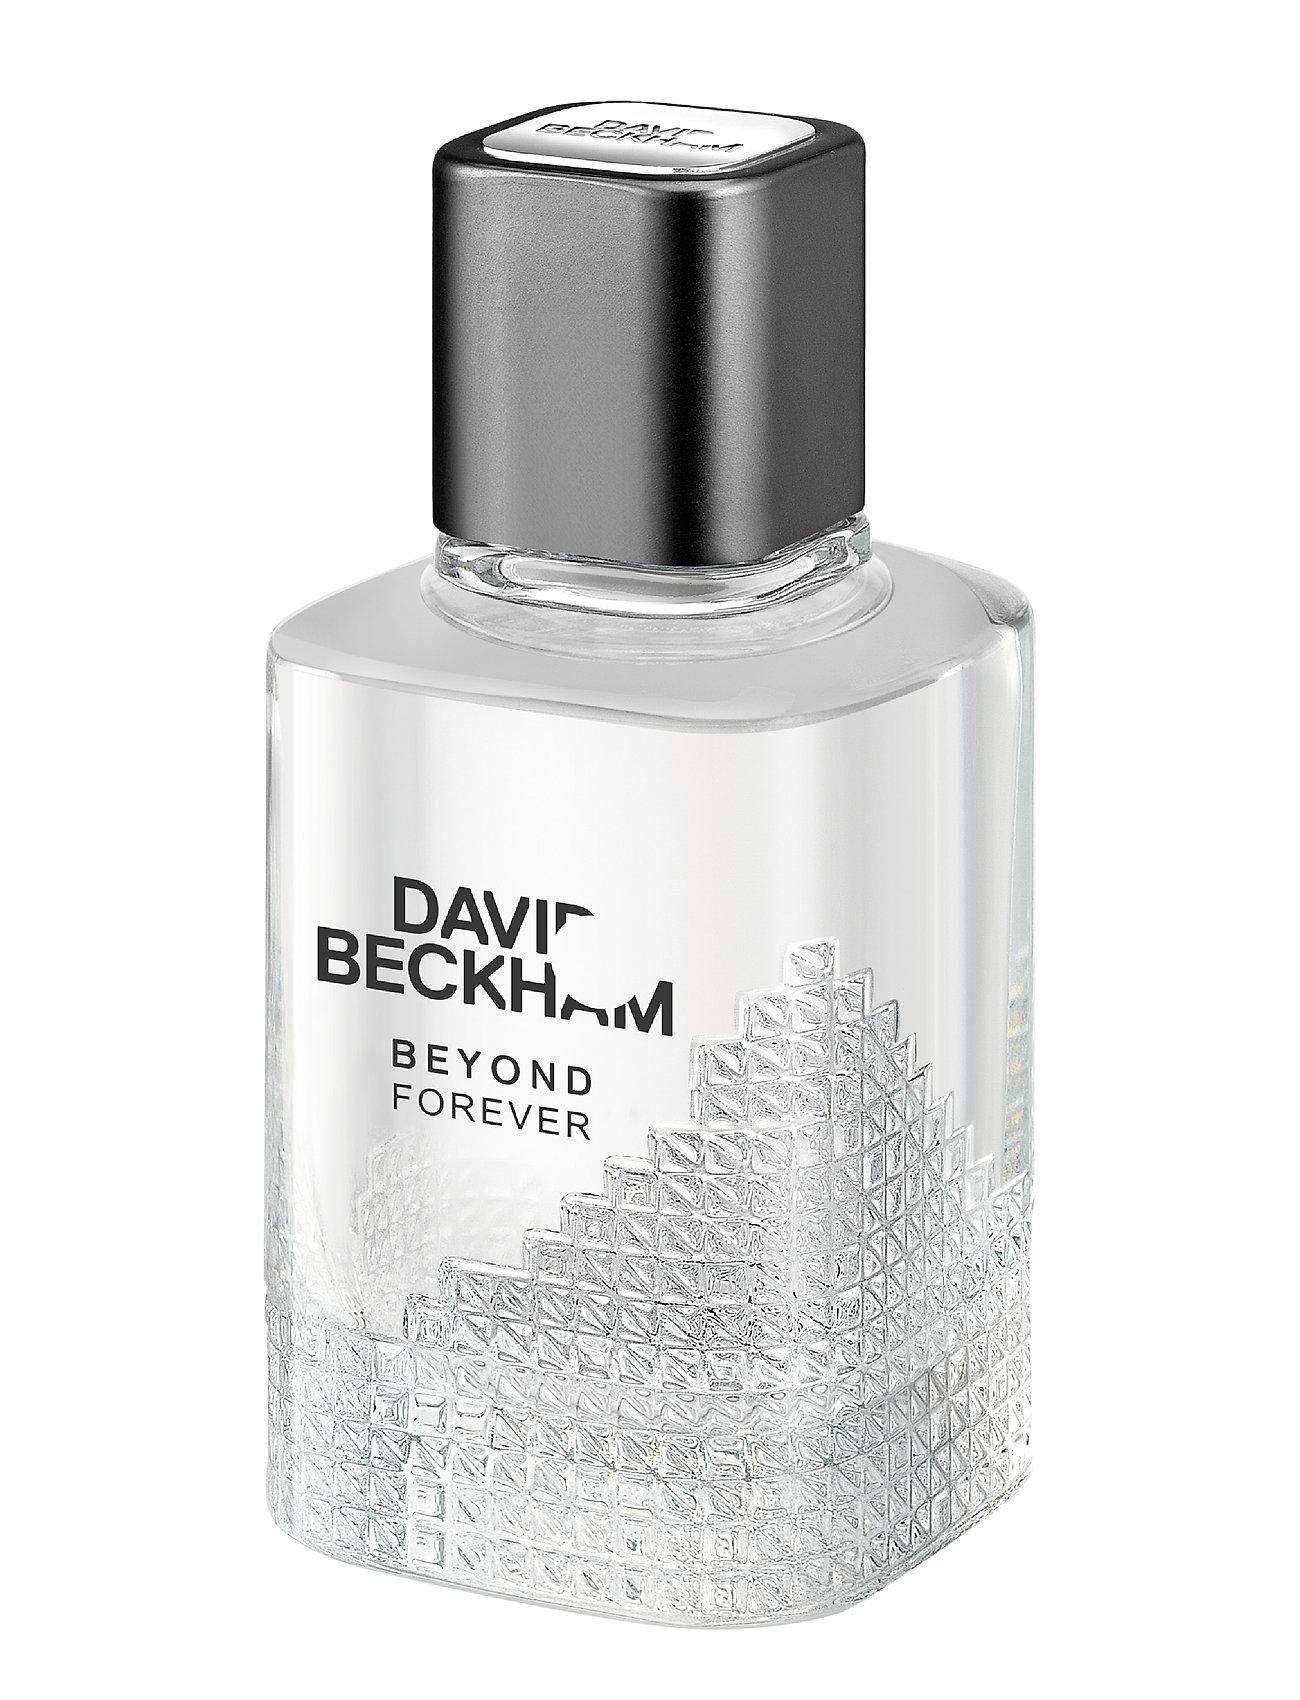 david beckham – David beckham beyond forever eau de på boozt.com dk